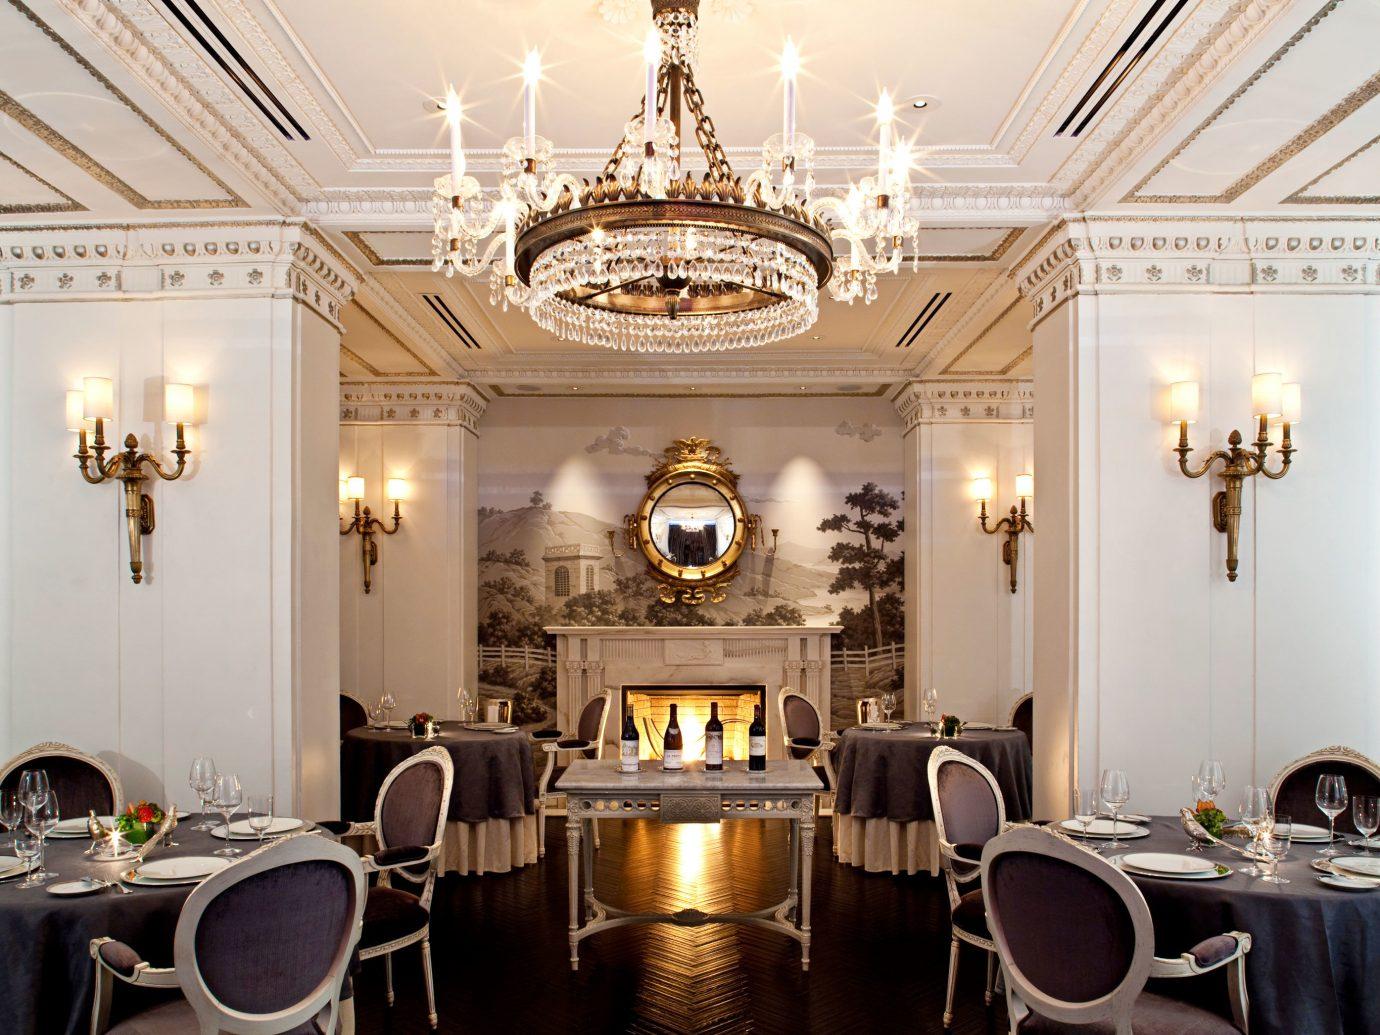 Restaurant at The Jefferson, Washington D.C.